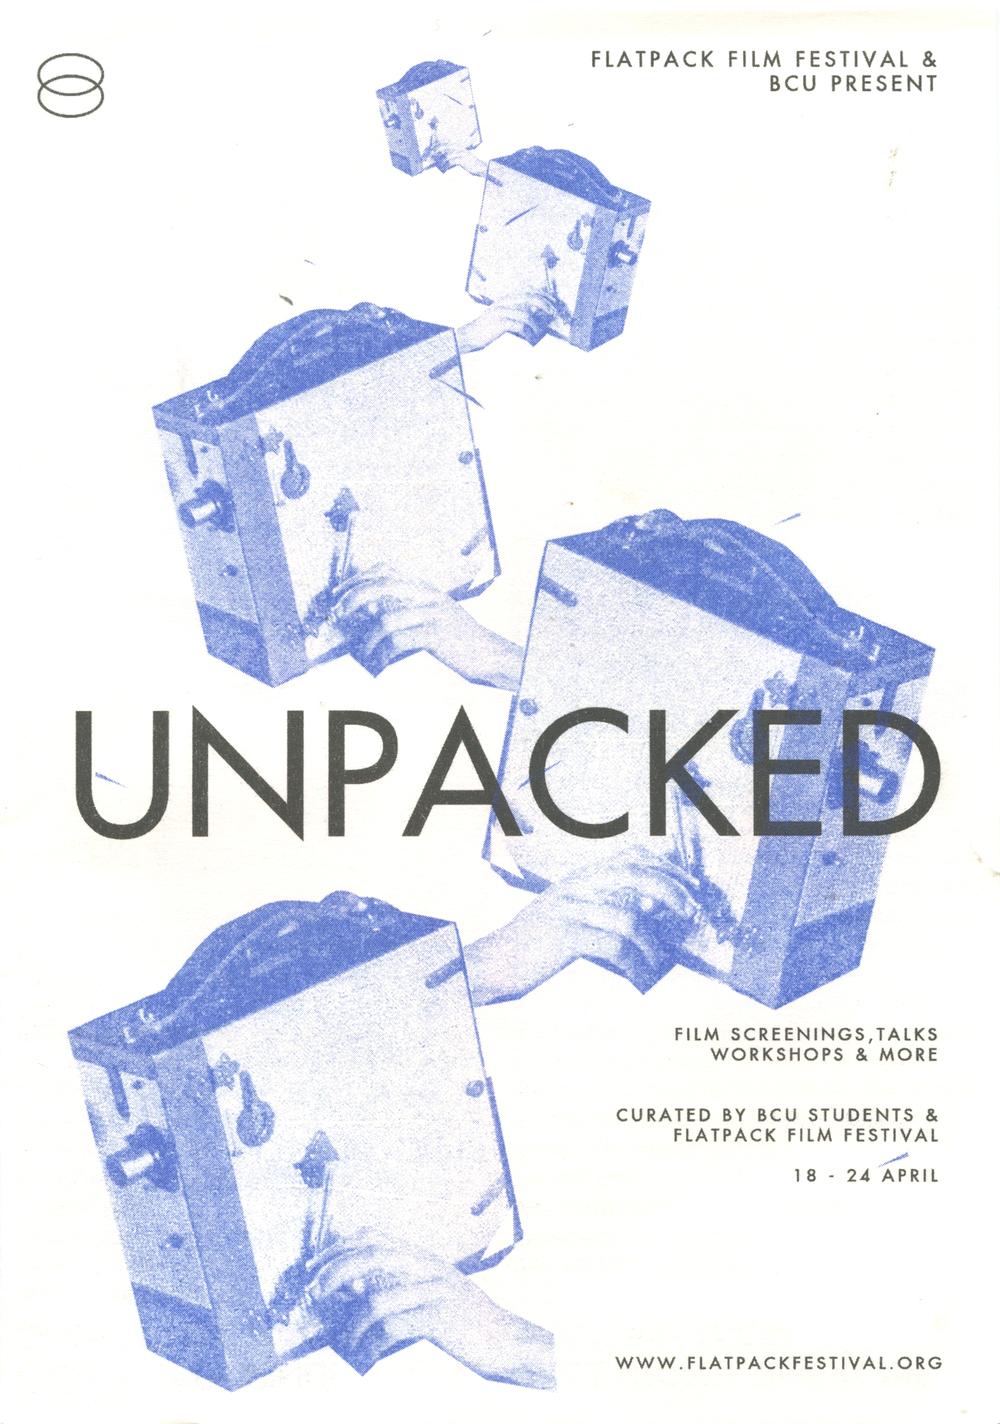 Unpacked